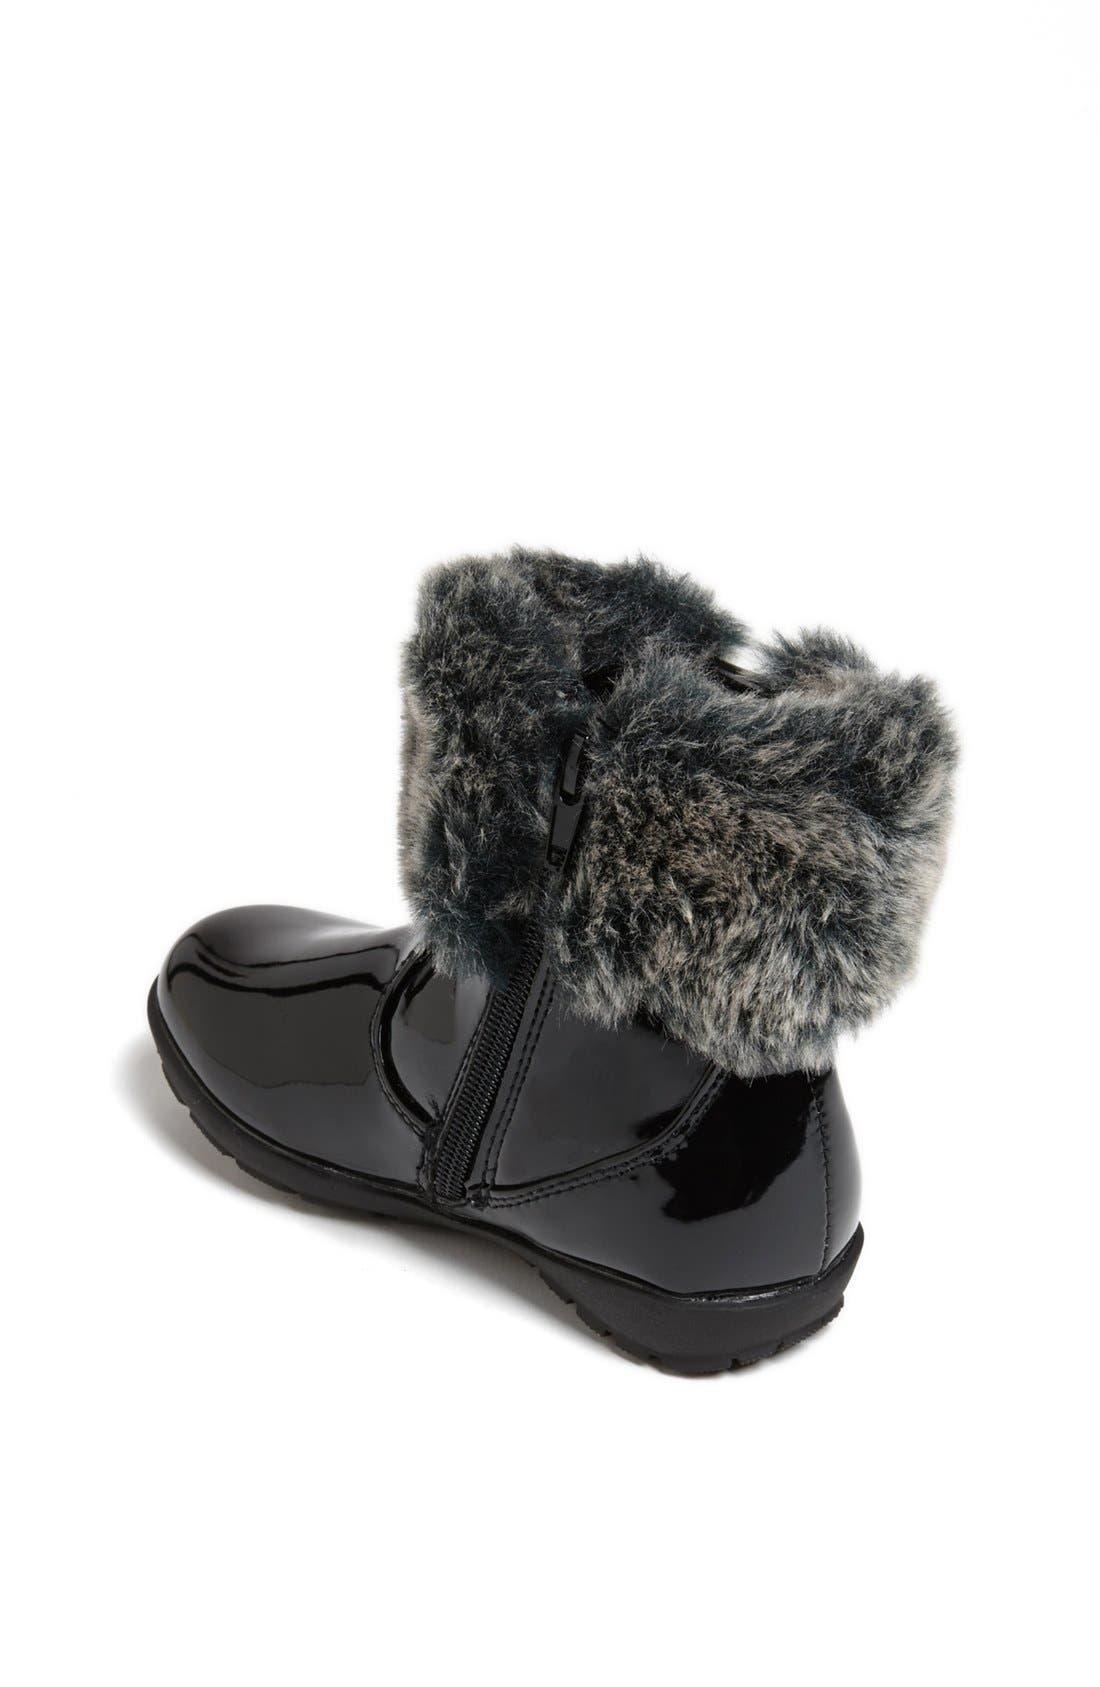 Alternate Image 2  - kensie girl Faux Fur Trim Boot (Walker & Toddler)